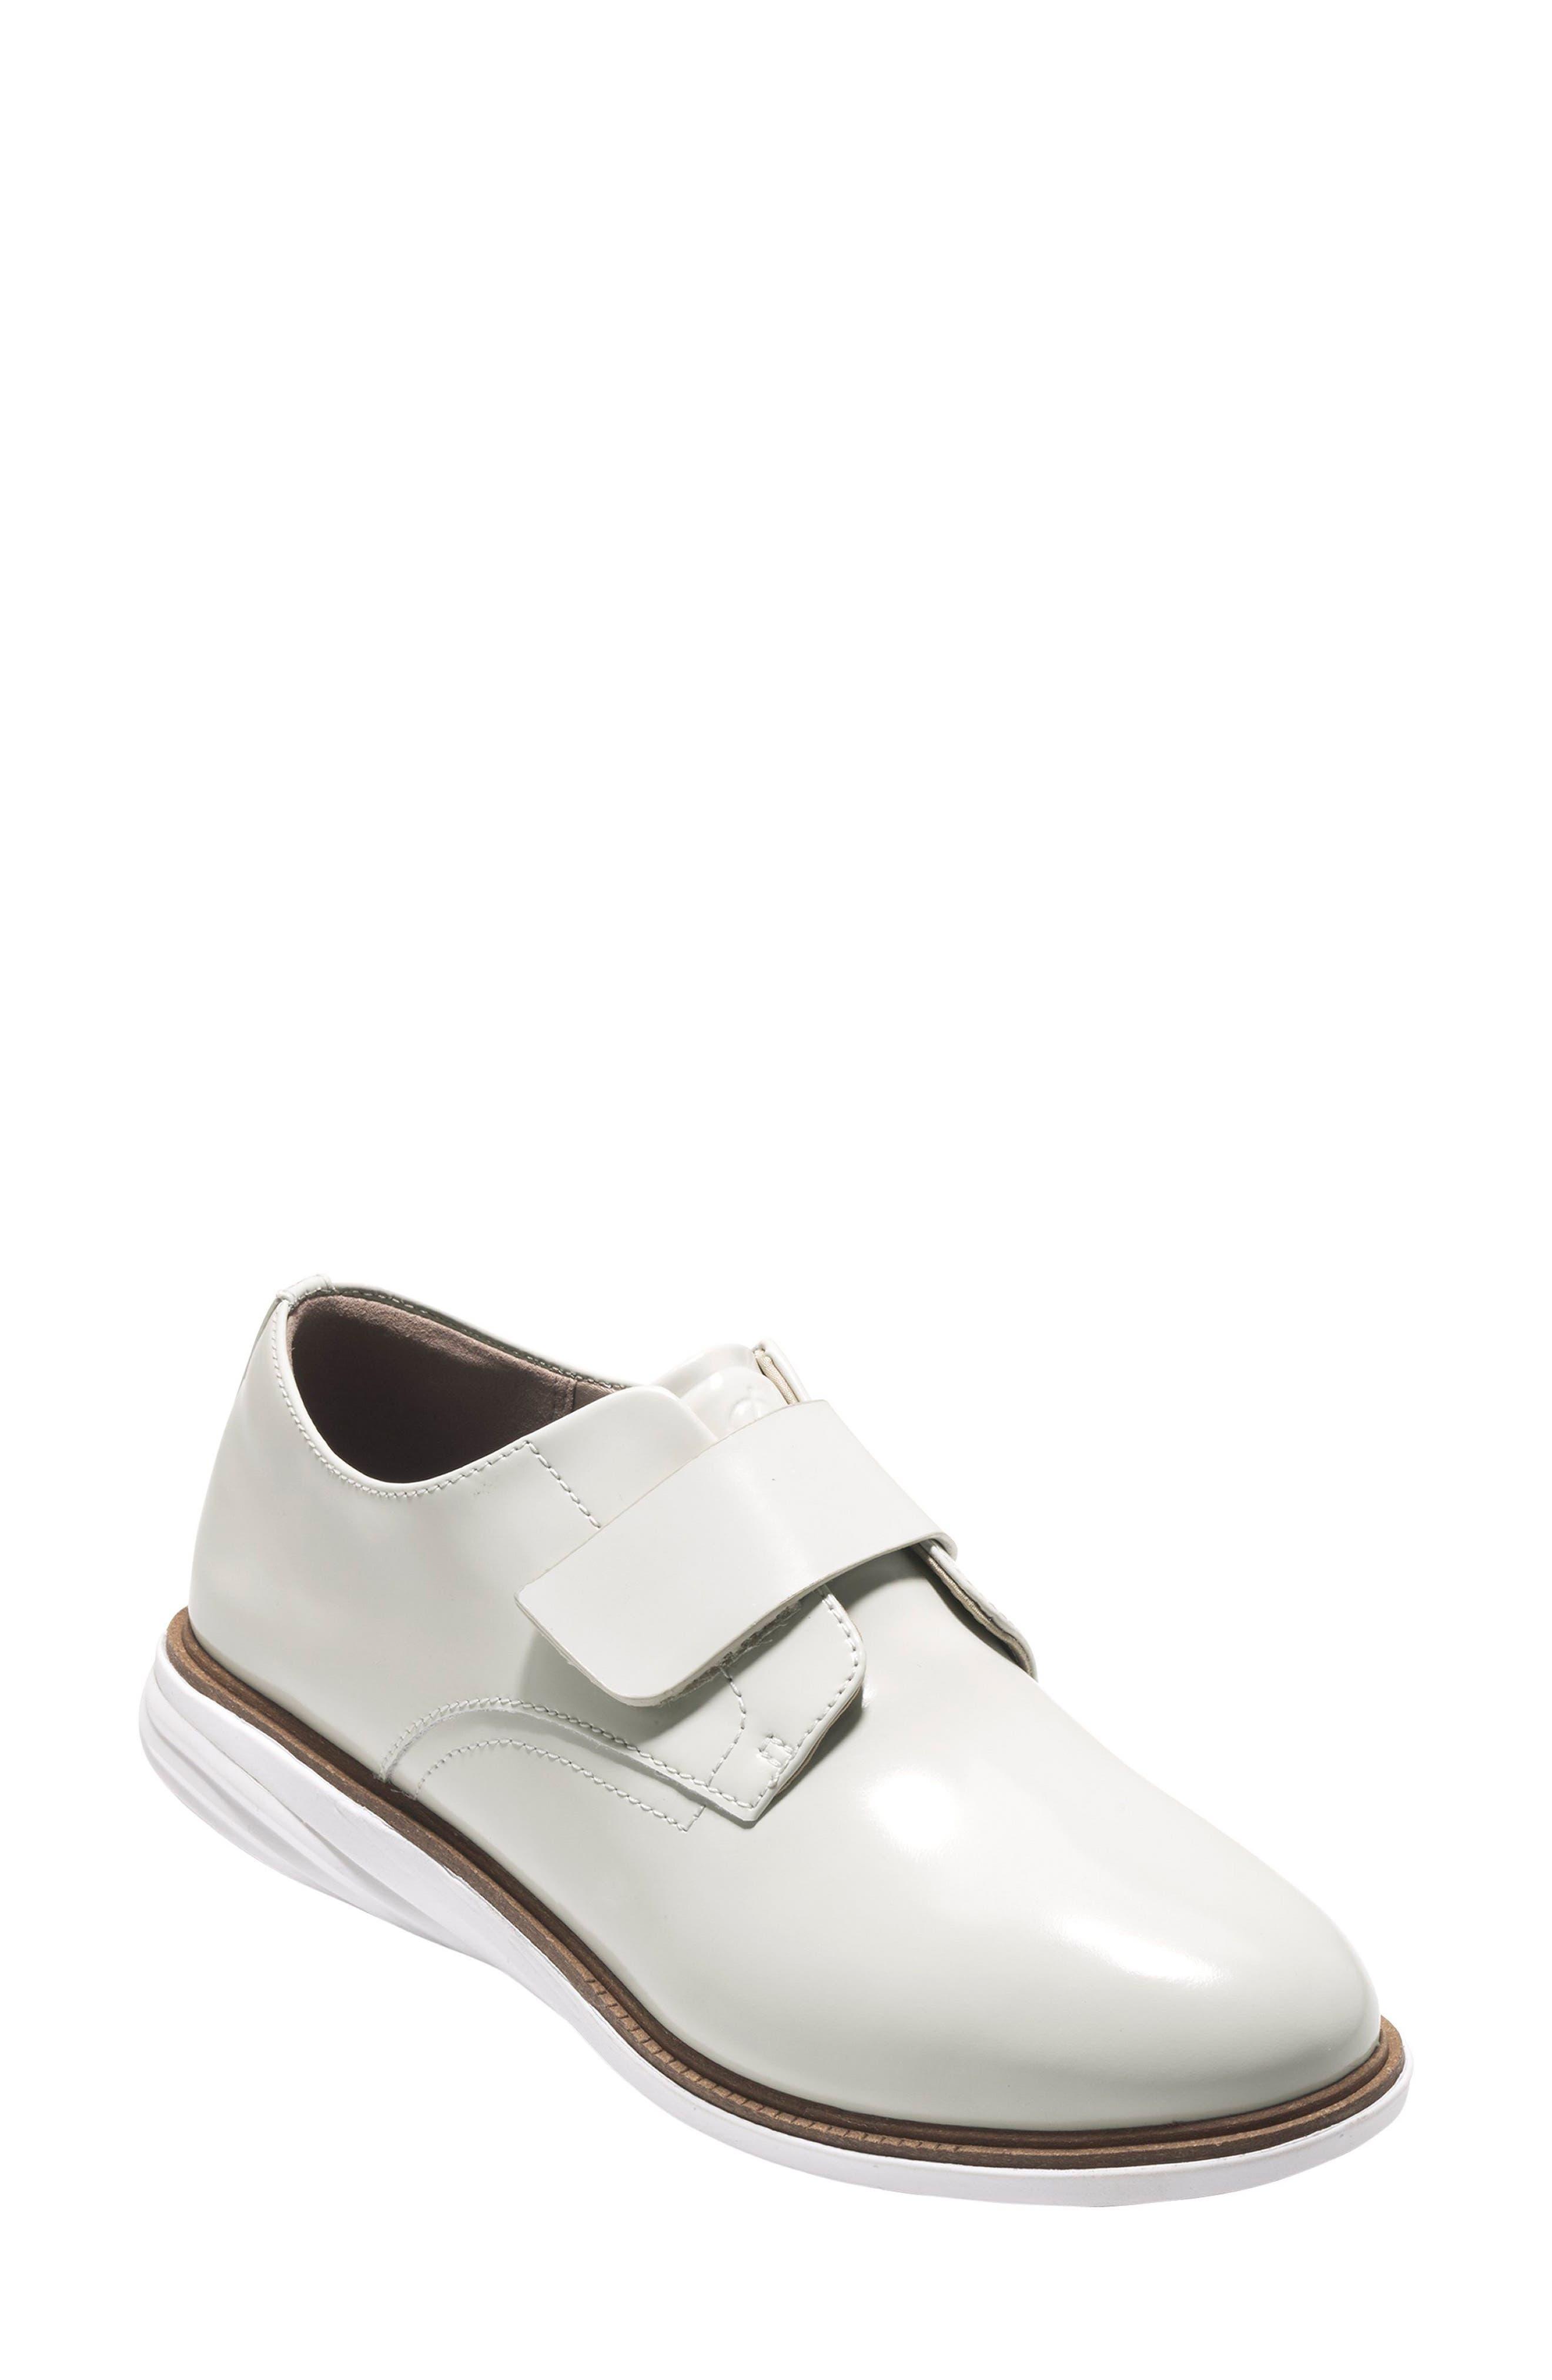 Grandevolution Oxford Sneaker,                         Main,                         color, Optic White Leather